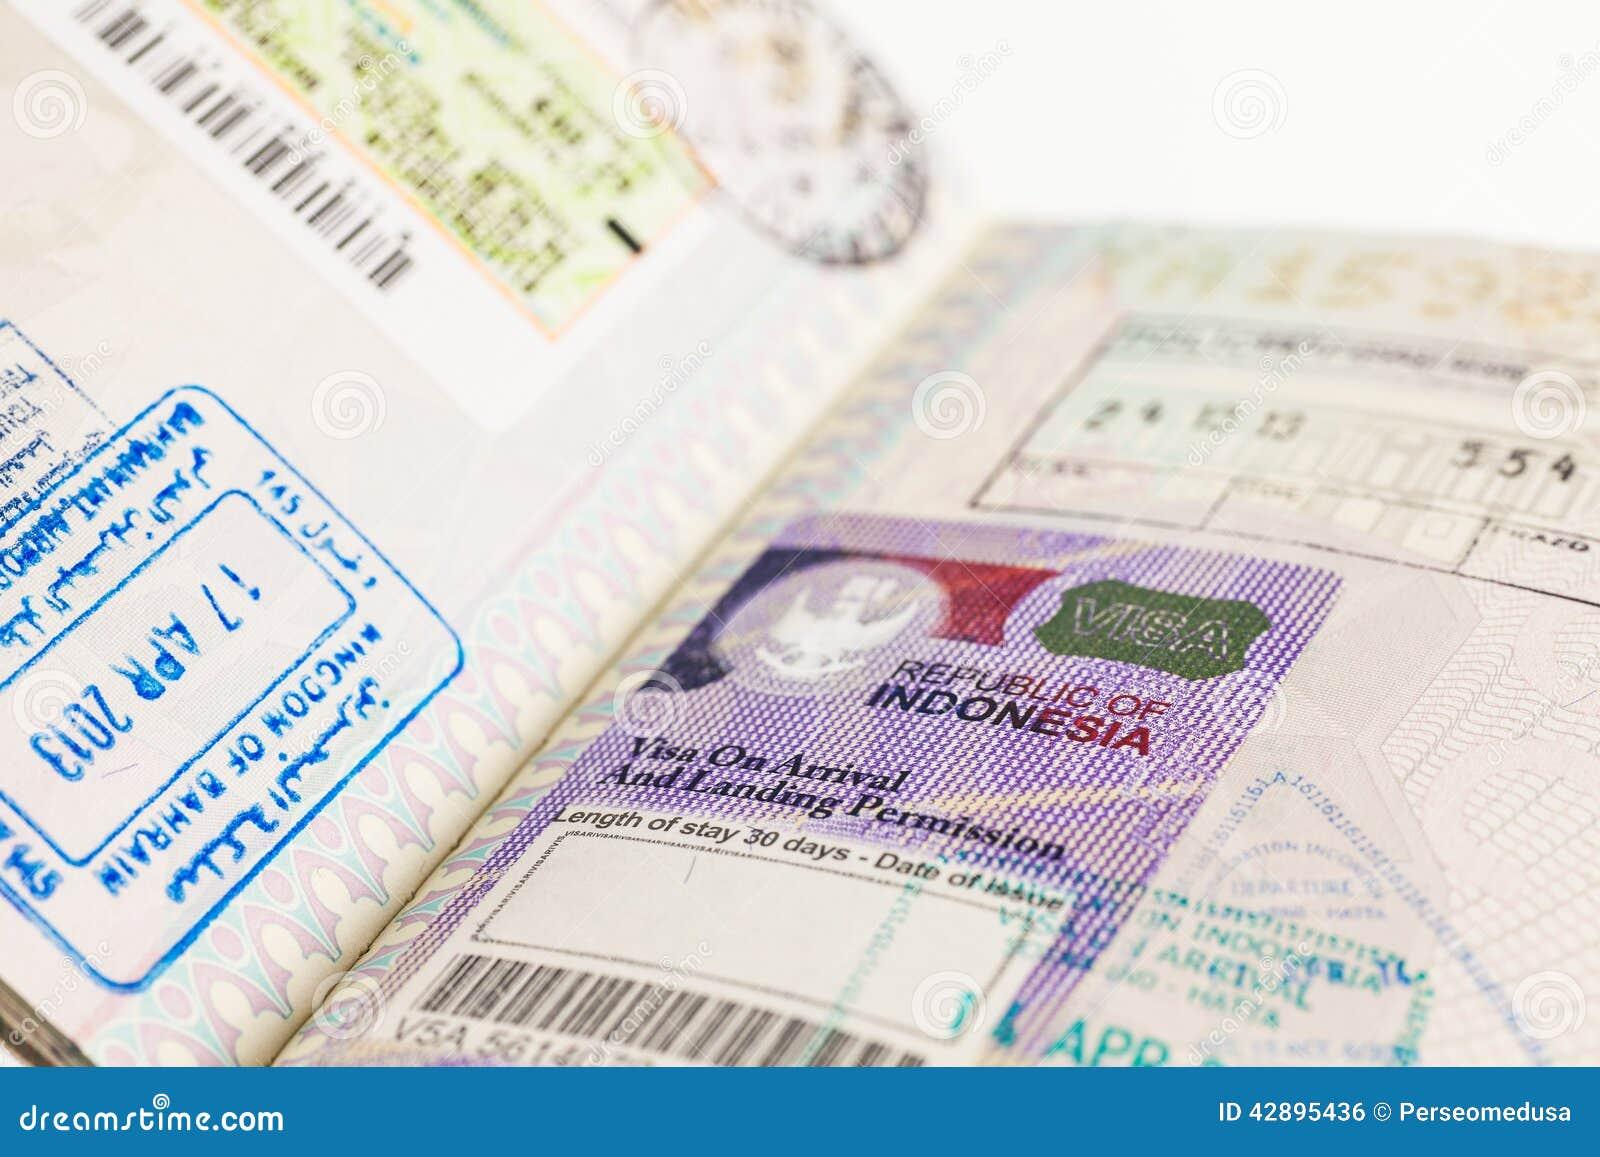 Indonesien-Visum